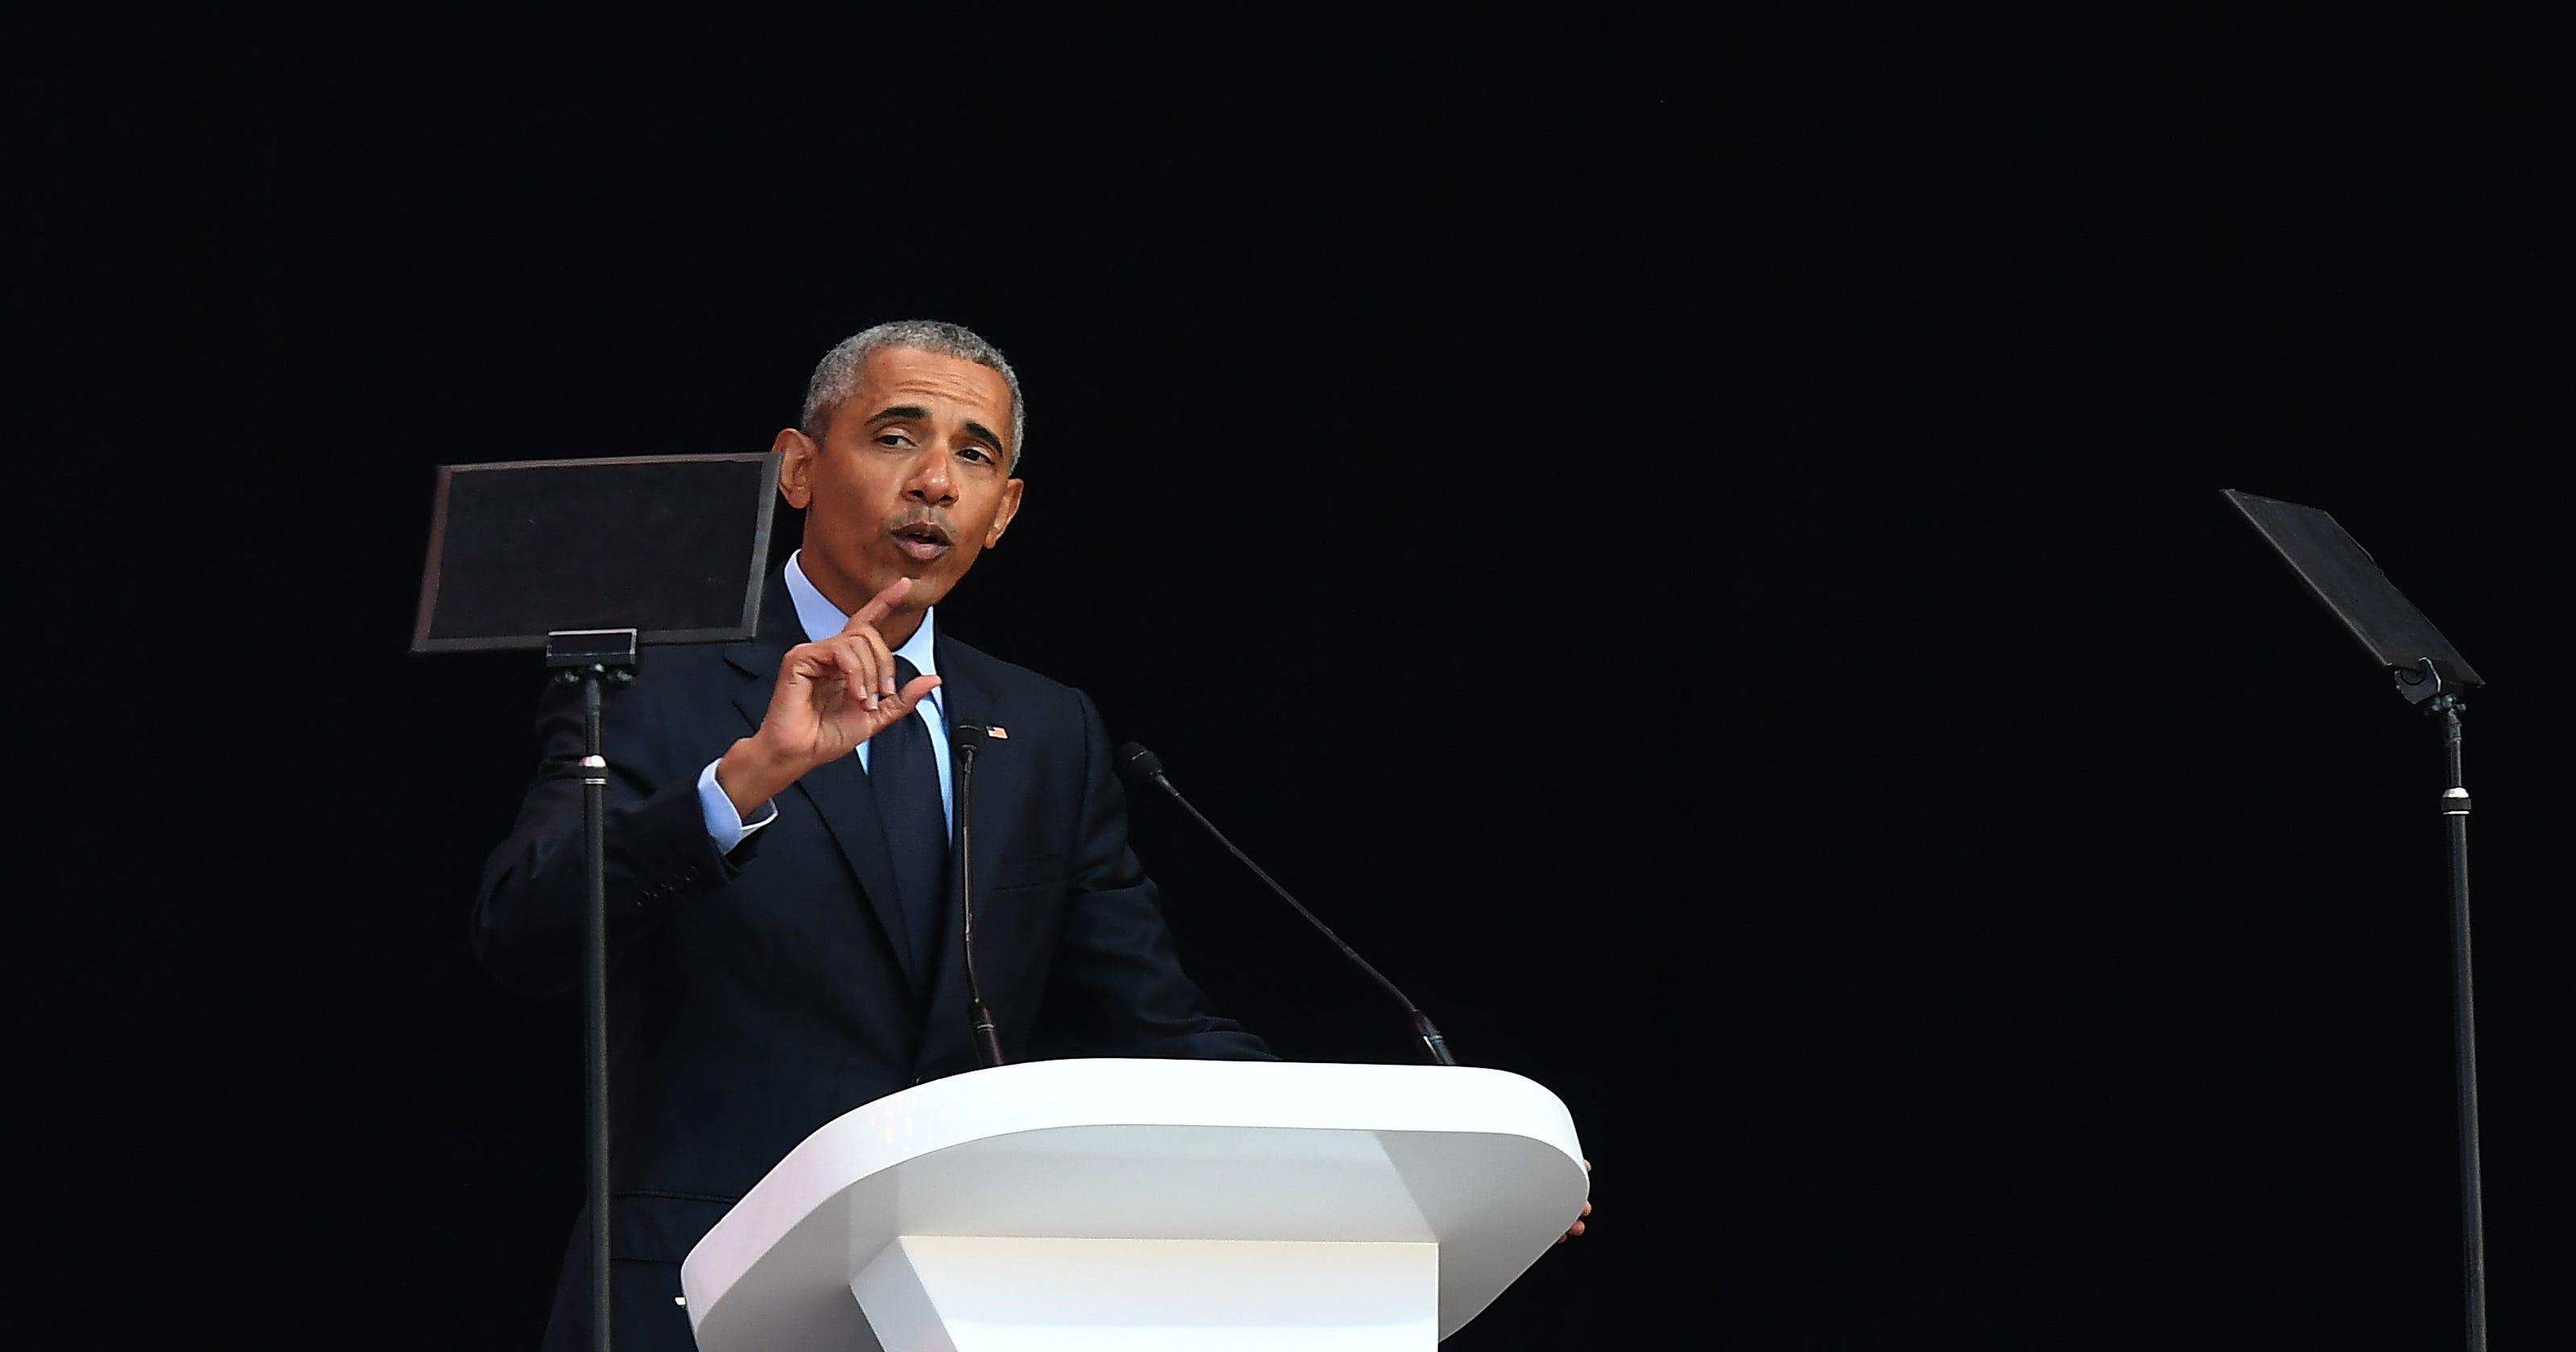 Never mentioning Trump, Barack Obama warns of \'politics of fear\'